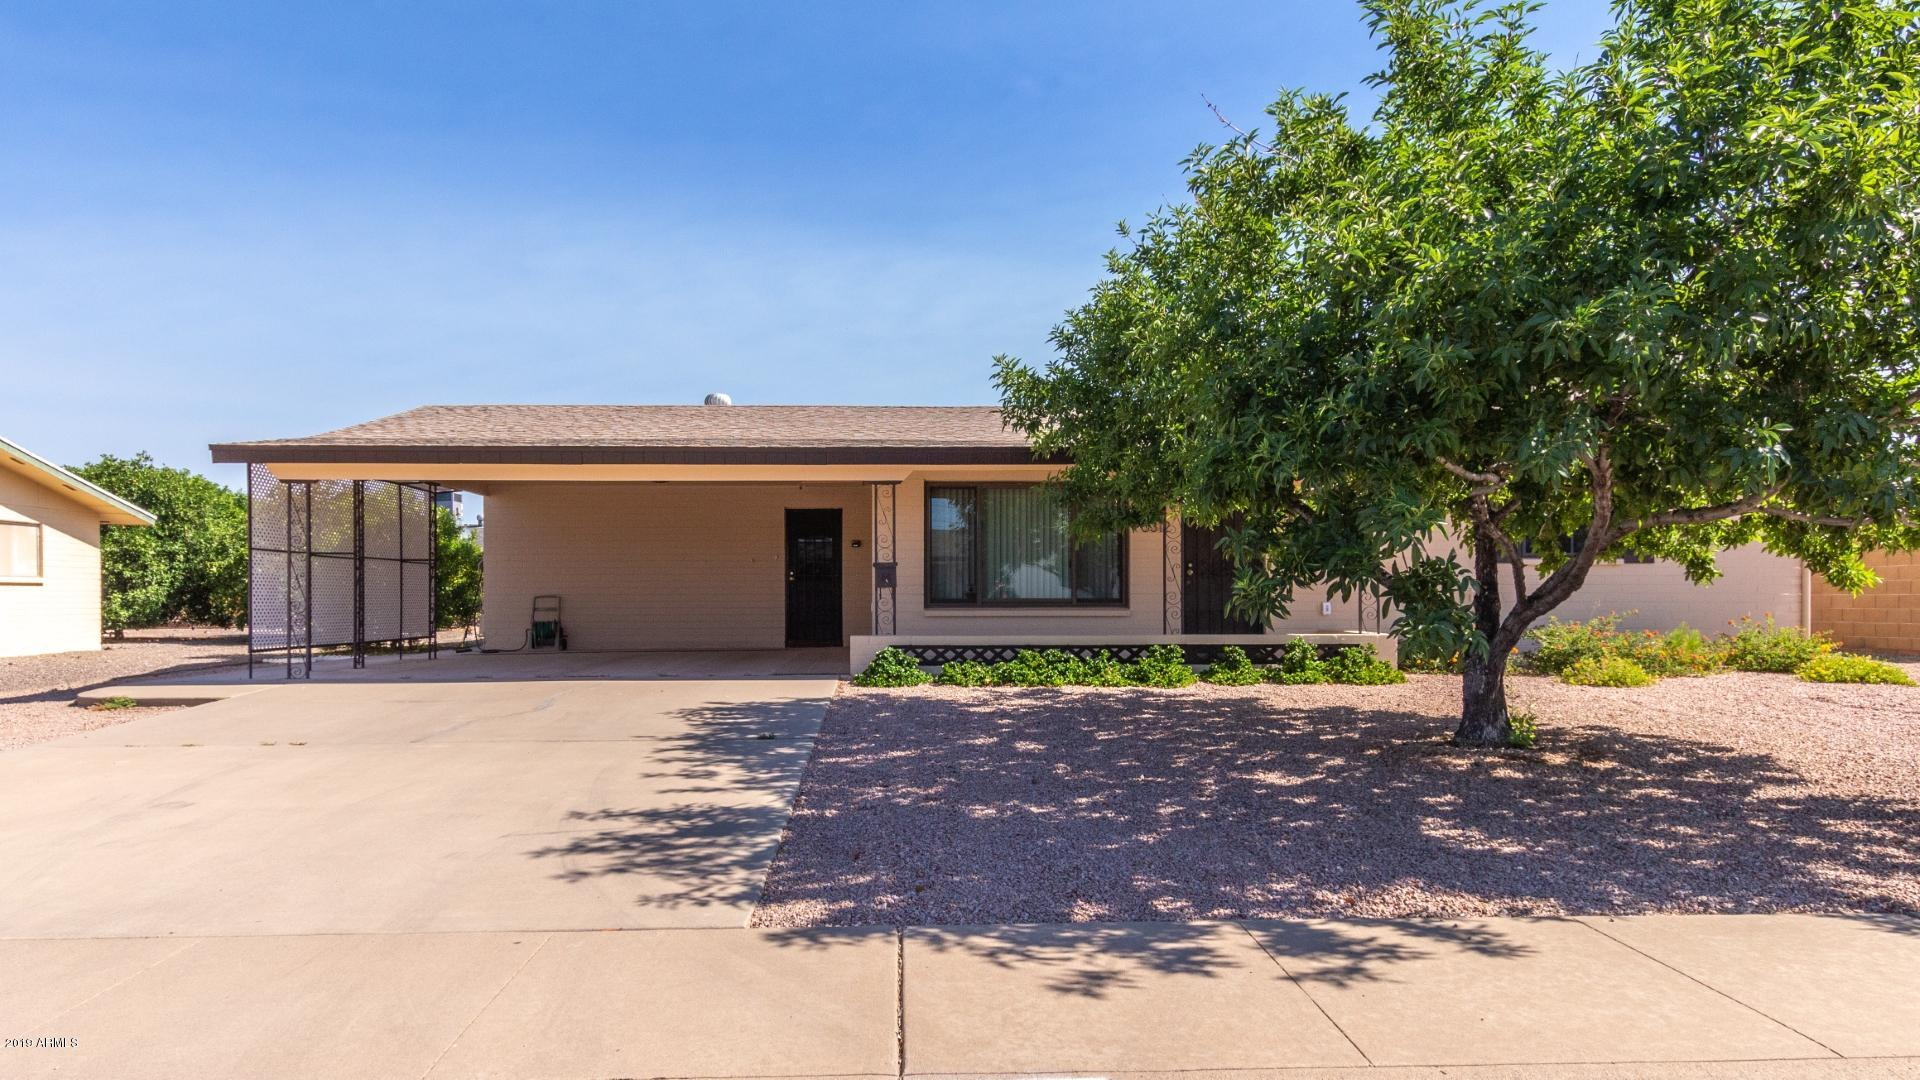 Photo of 5312 E DECATUR Street, Mesa, AZ 85205